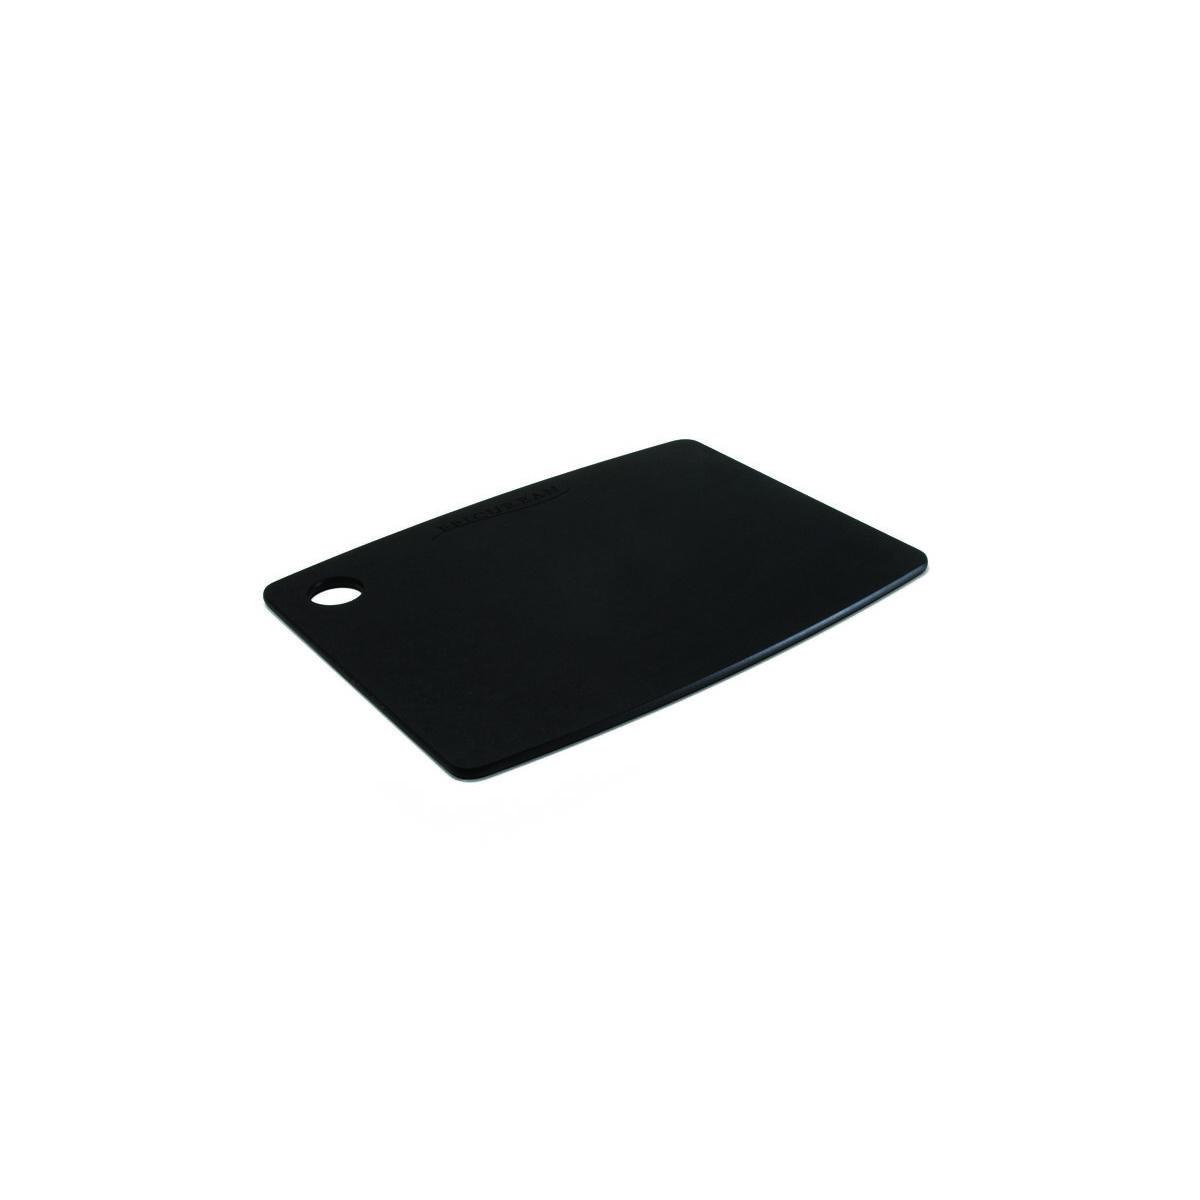 Slate Cutting surface 8x6inch